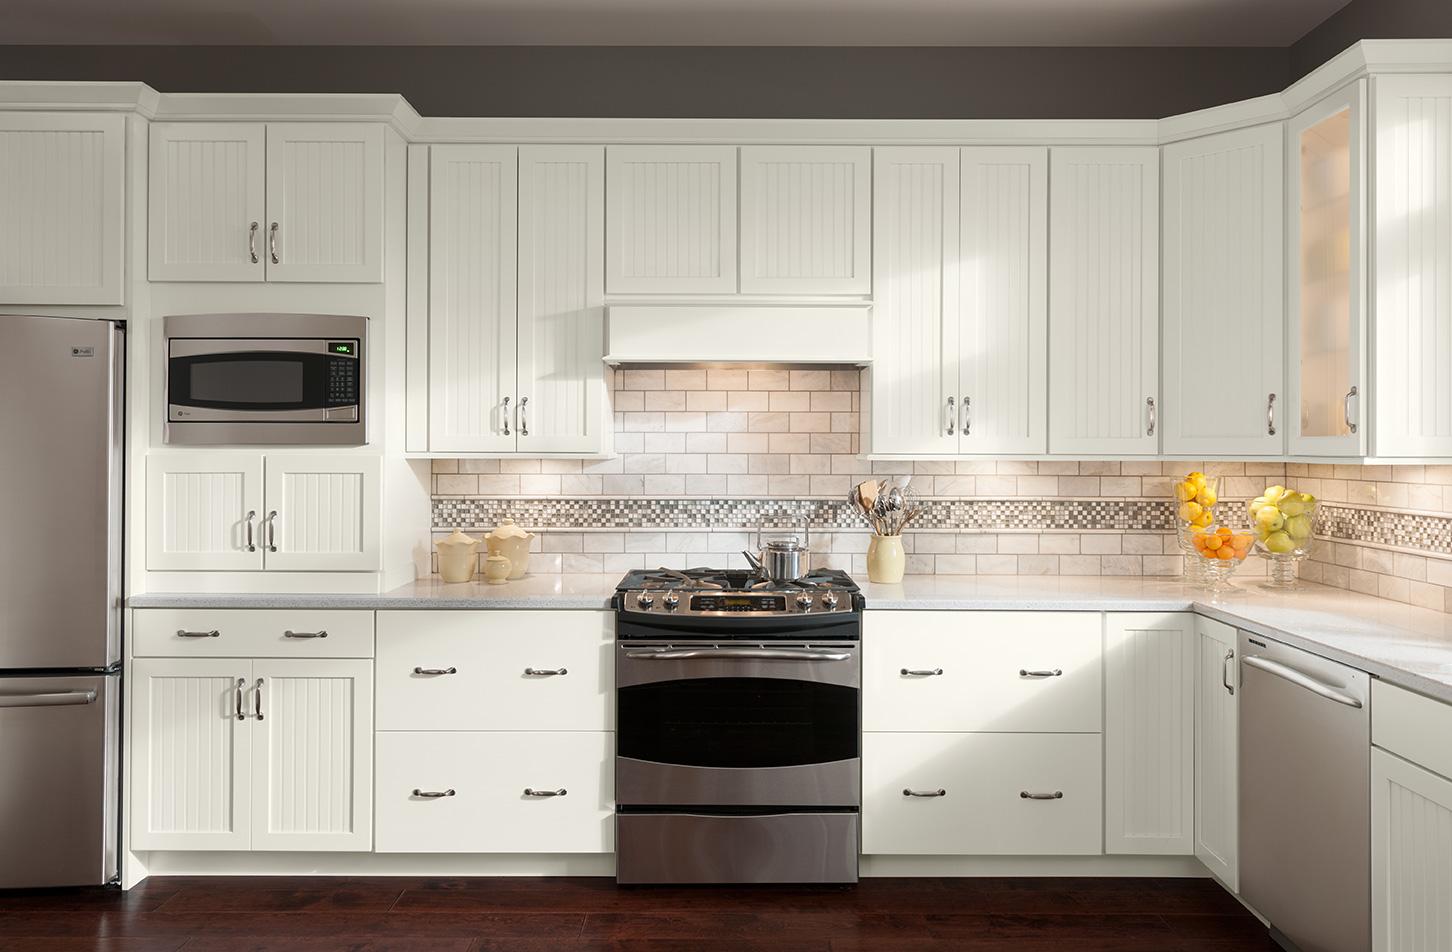 yorktowne-cabinets-bathroom-contemporary-with-baltimore-bedding-captivating-kitchen-design-with-yorktowne-cabinets-york-kitchen-cabinets-yorktowne-cabinet-yorktowne-yorktown-cabinets.jpg